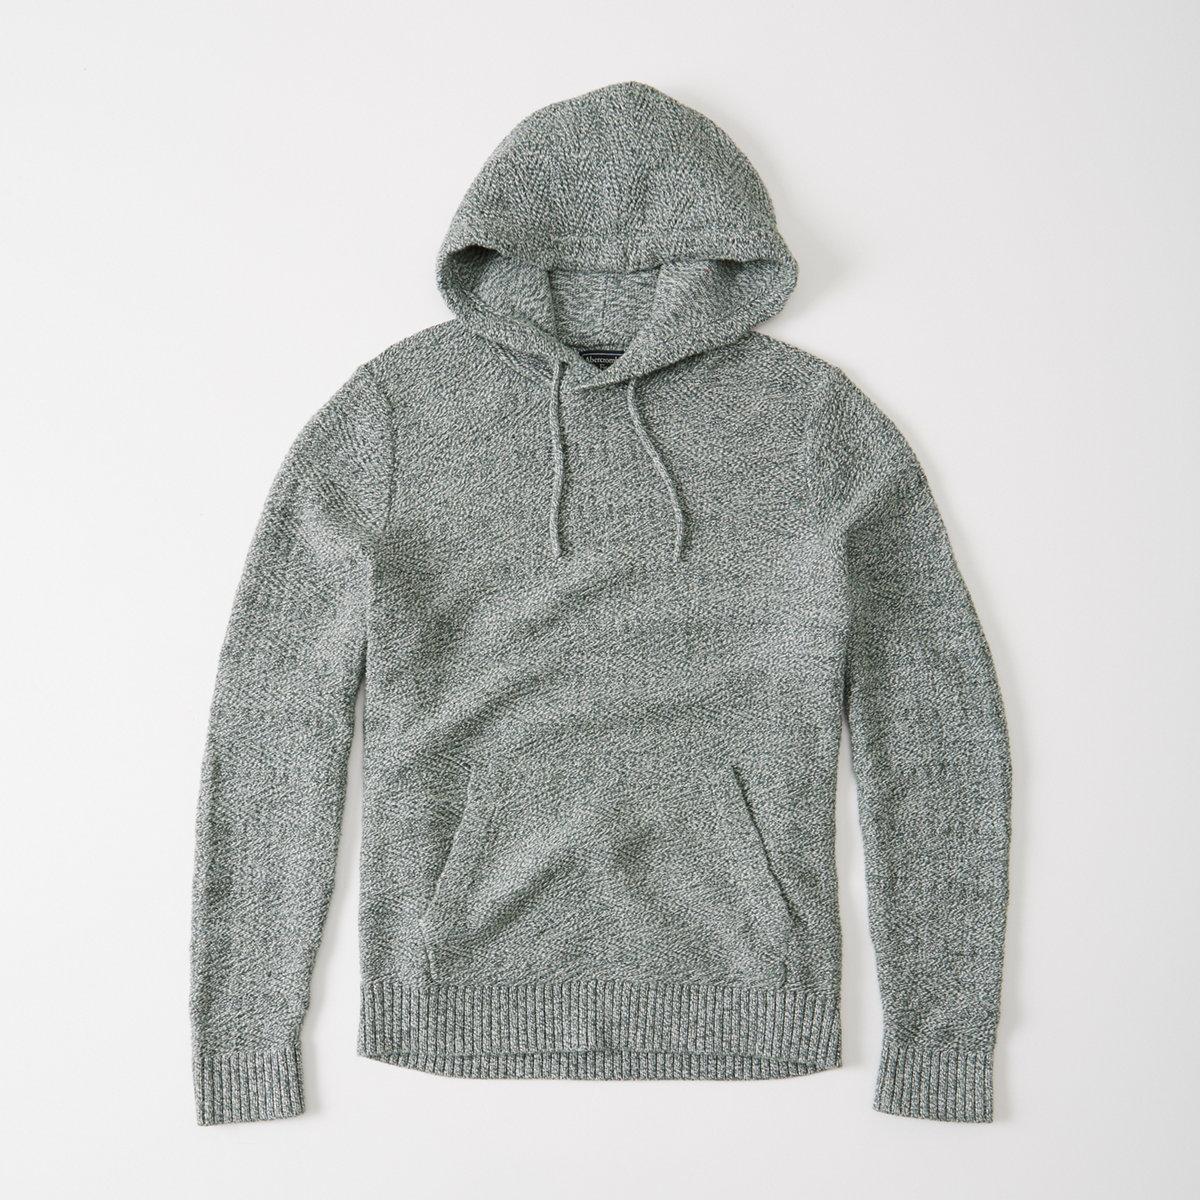 Stitched Hoodie